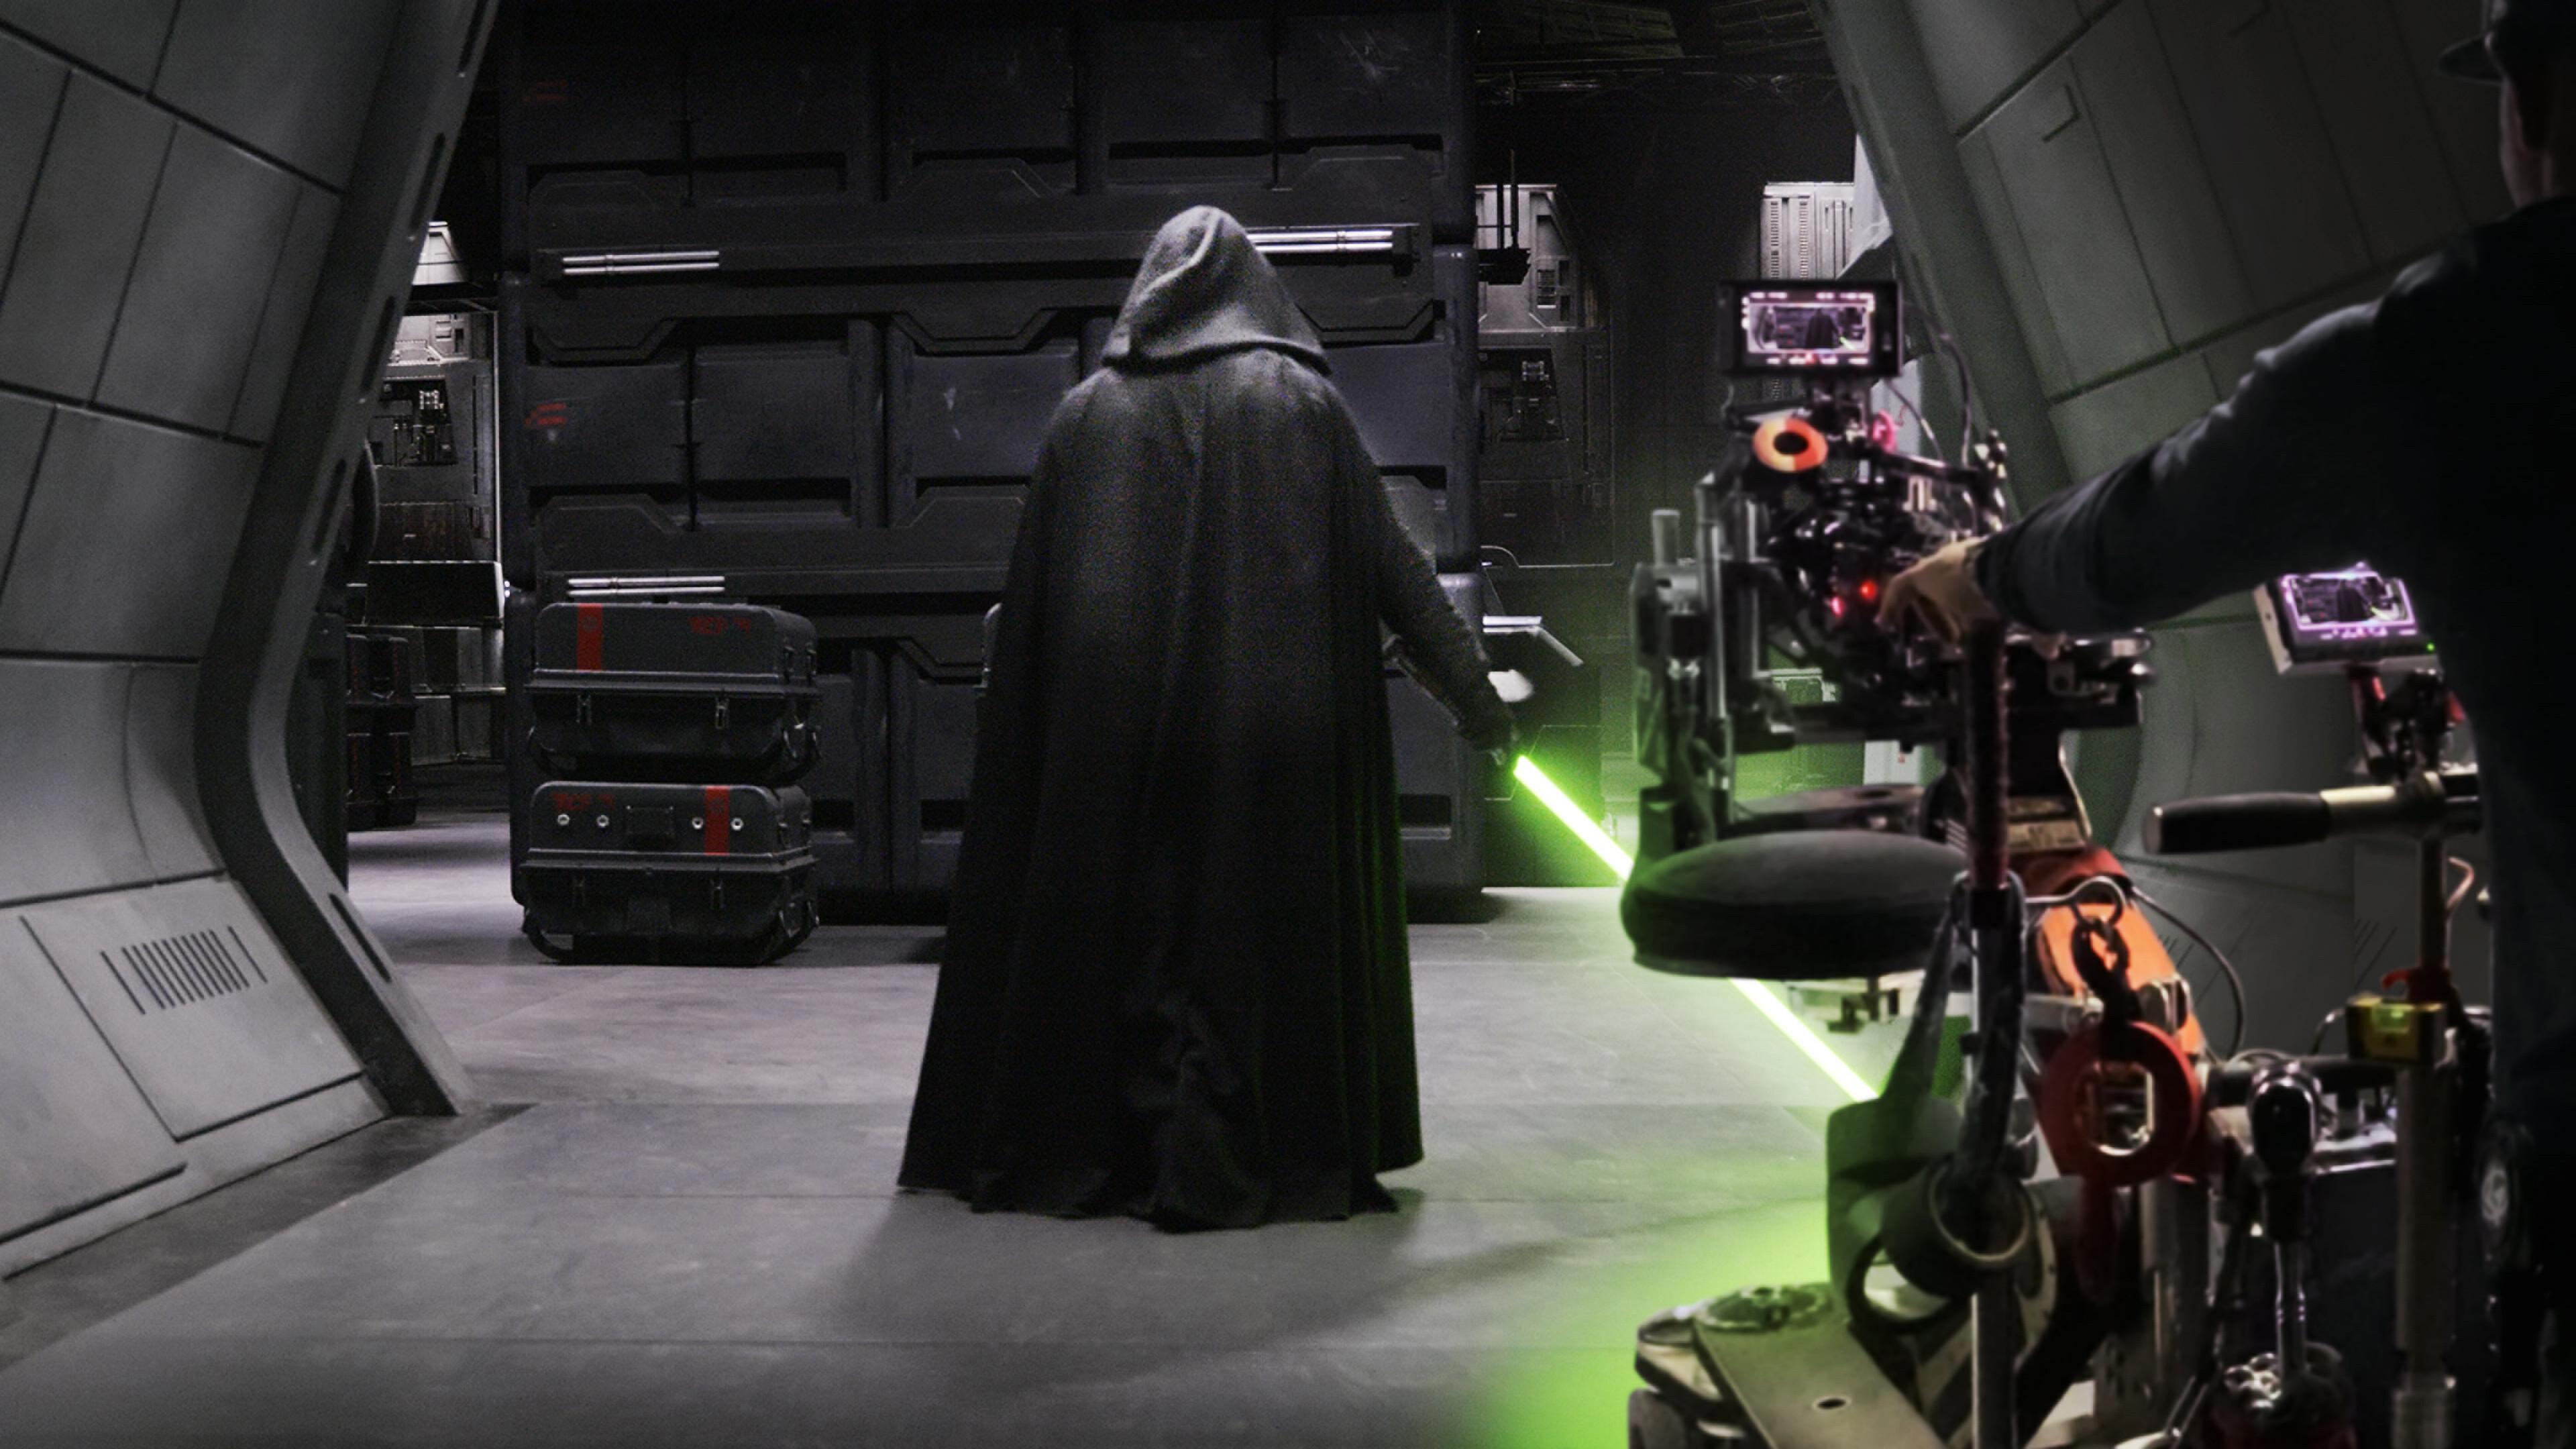 'The Mandalorian' reveals the tricks that brought Luke Skywalker back